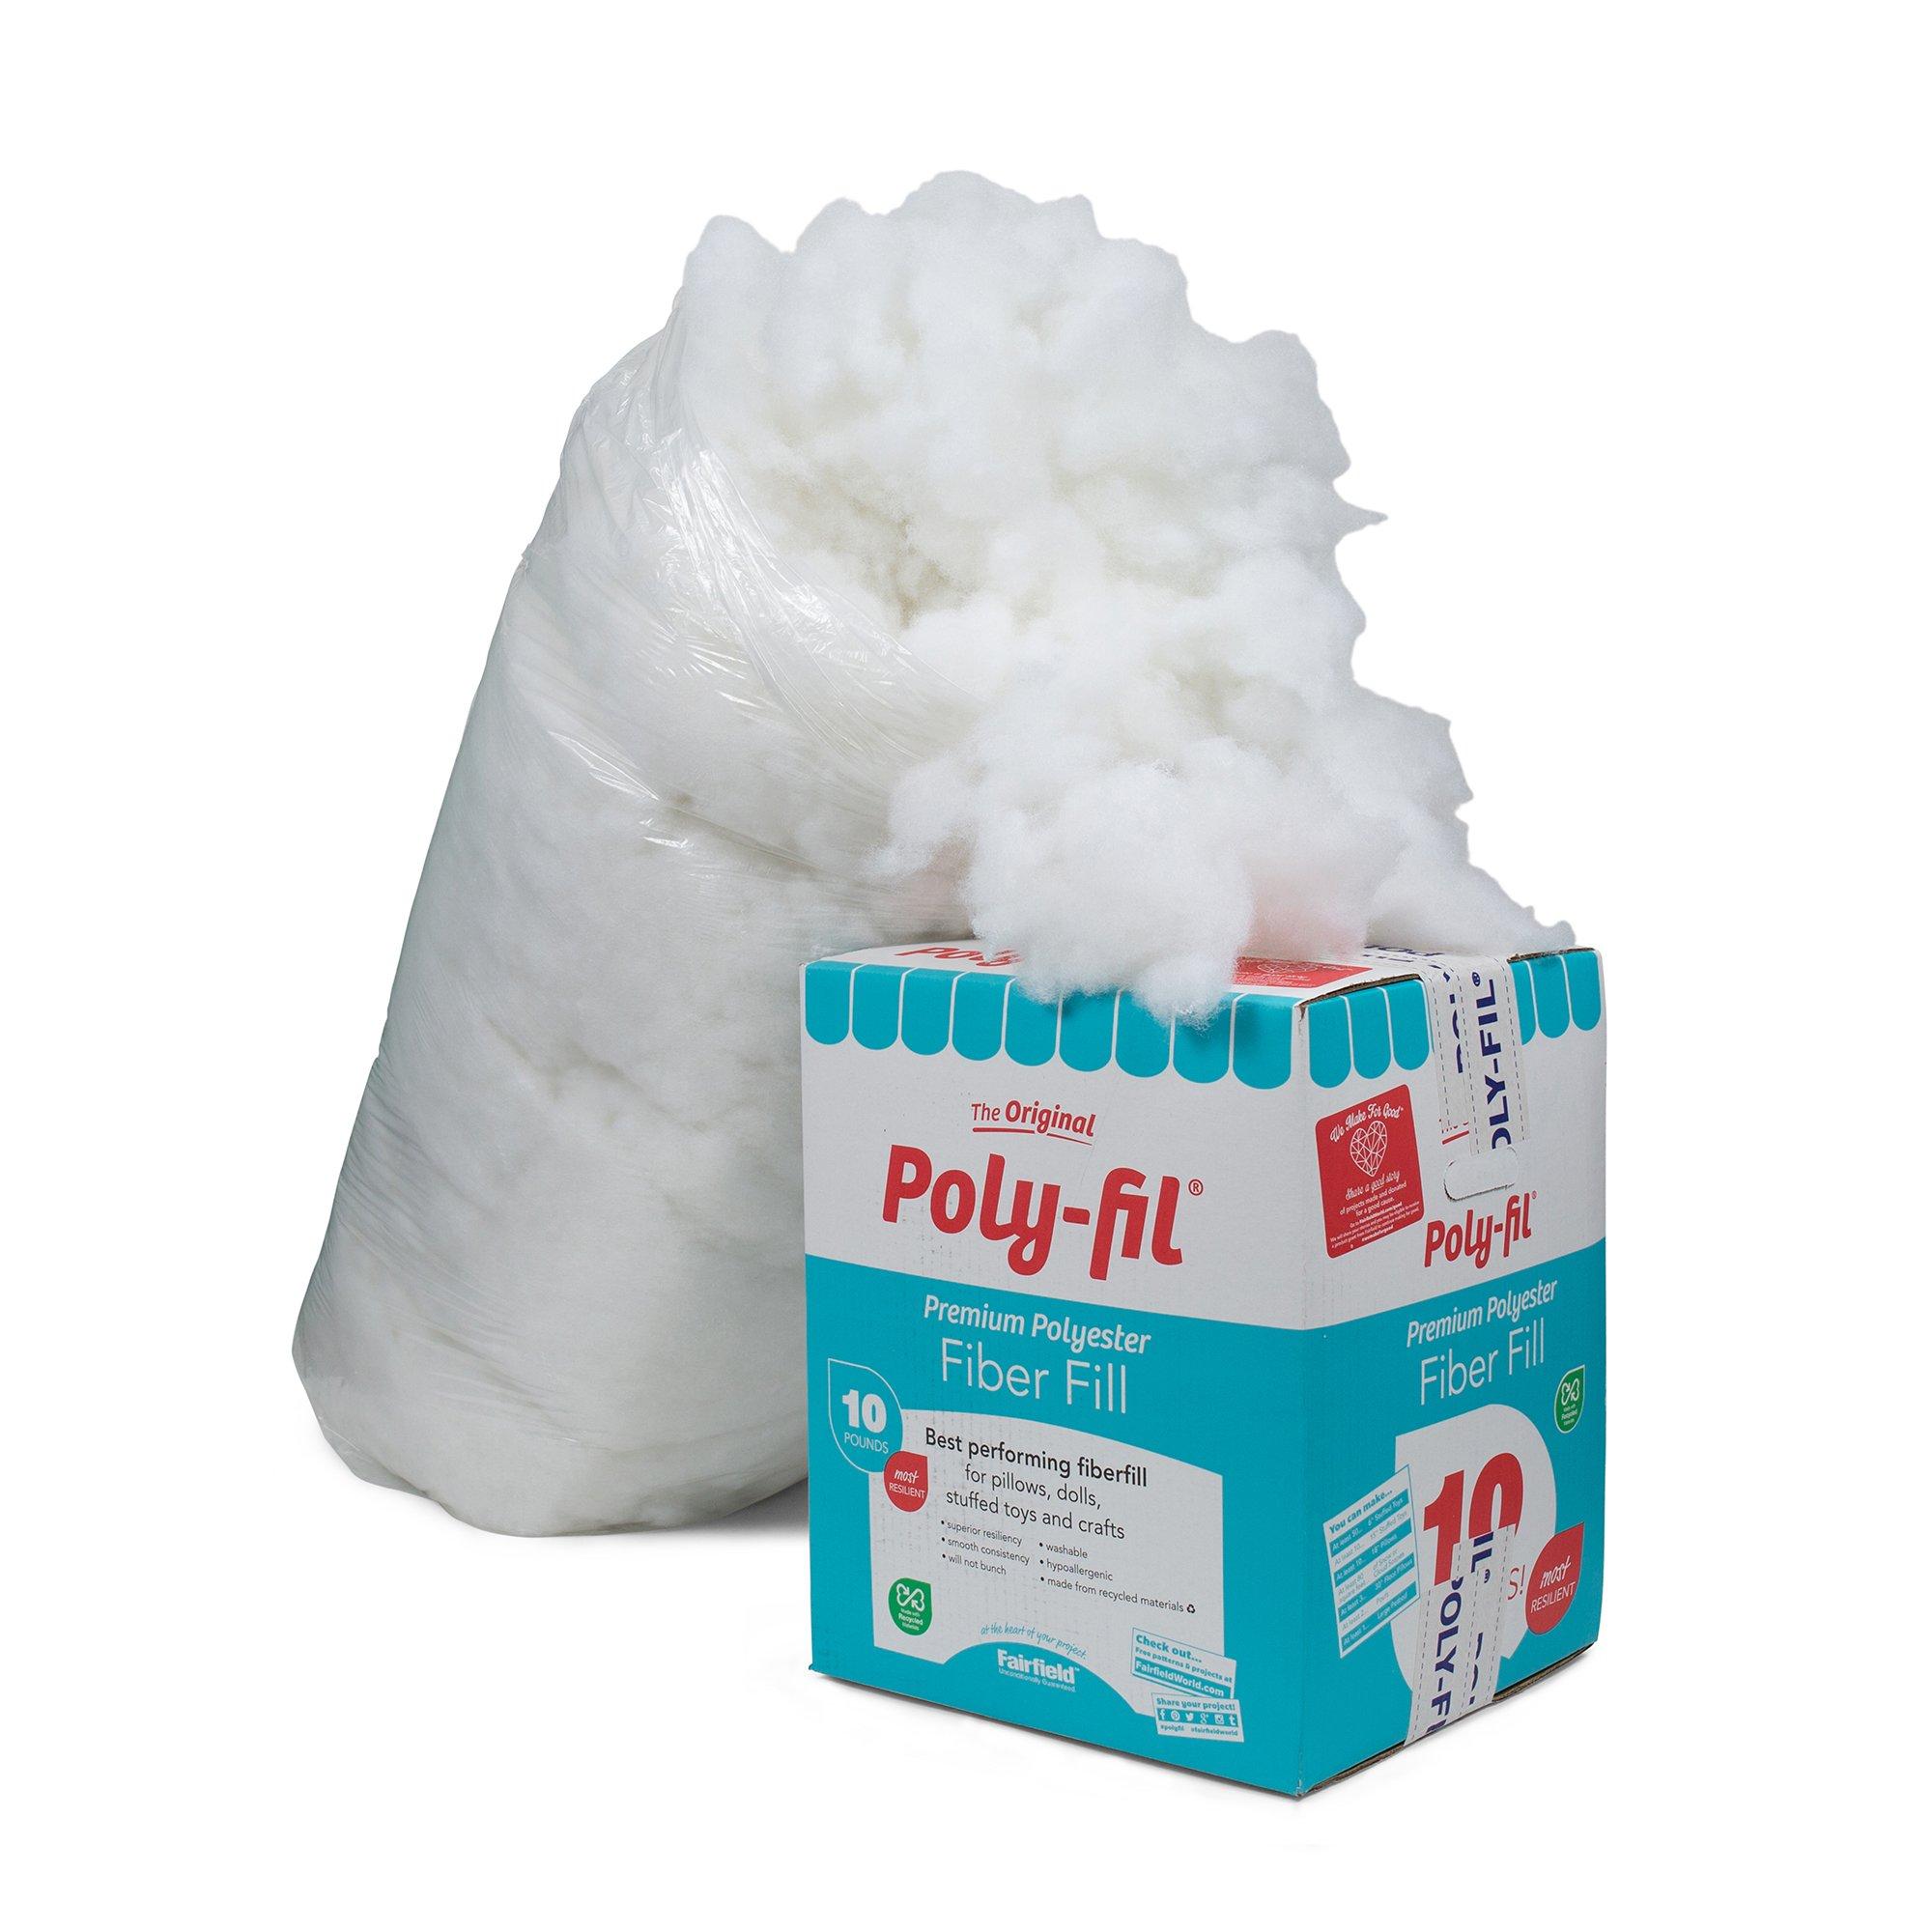 Fairfield PF-10 The Original Poly-Fil Premium 100% Fiber Fill Box, White, 10 lb by Fairfield